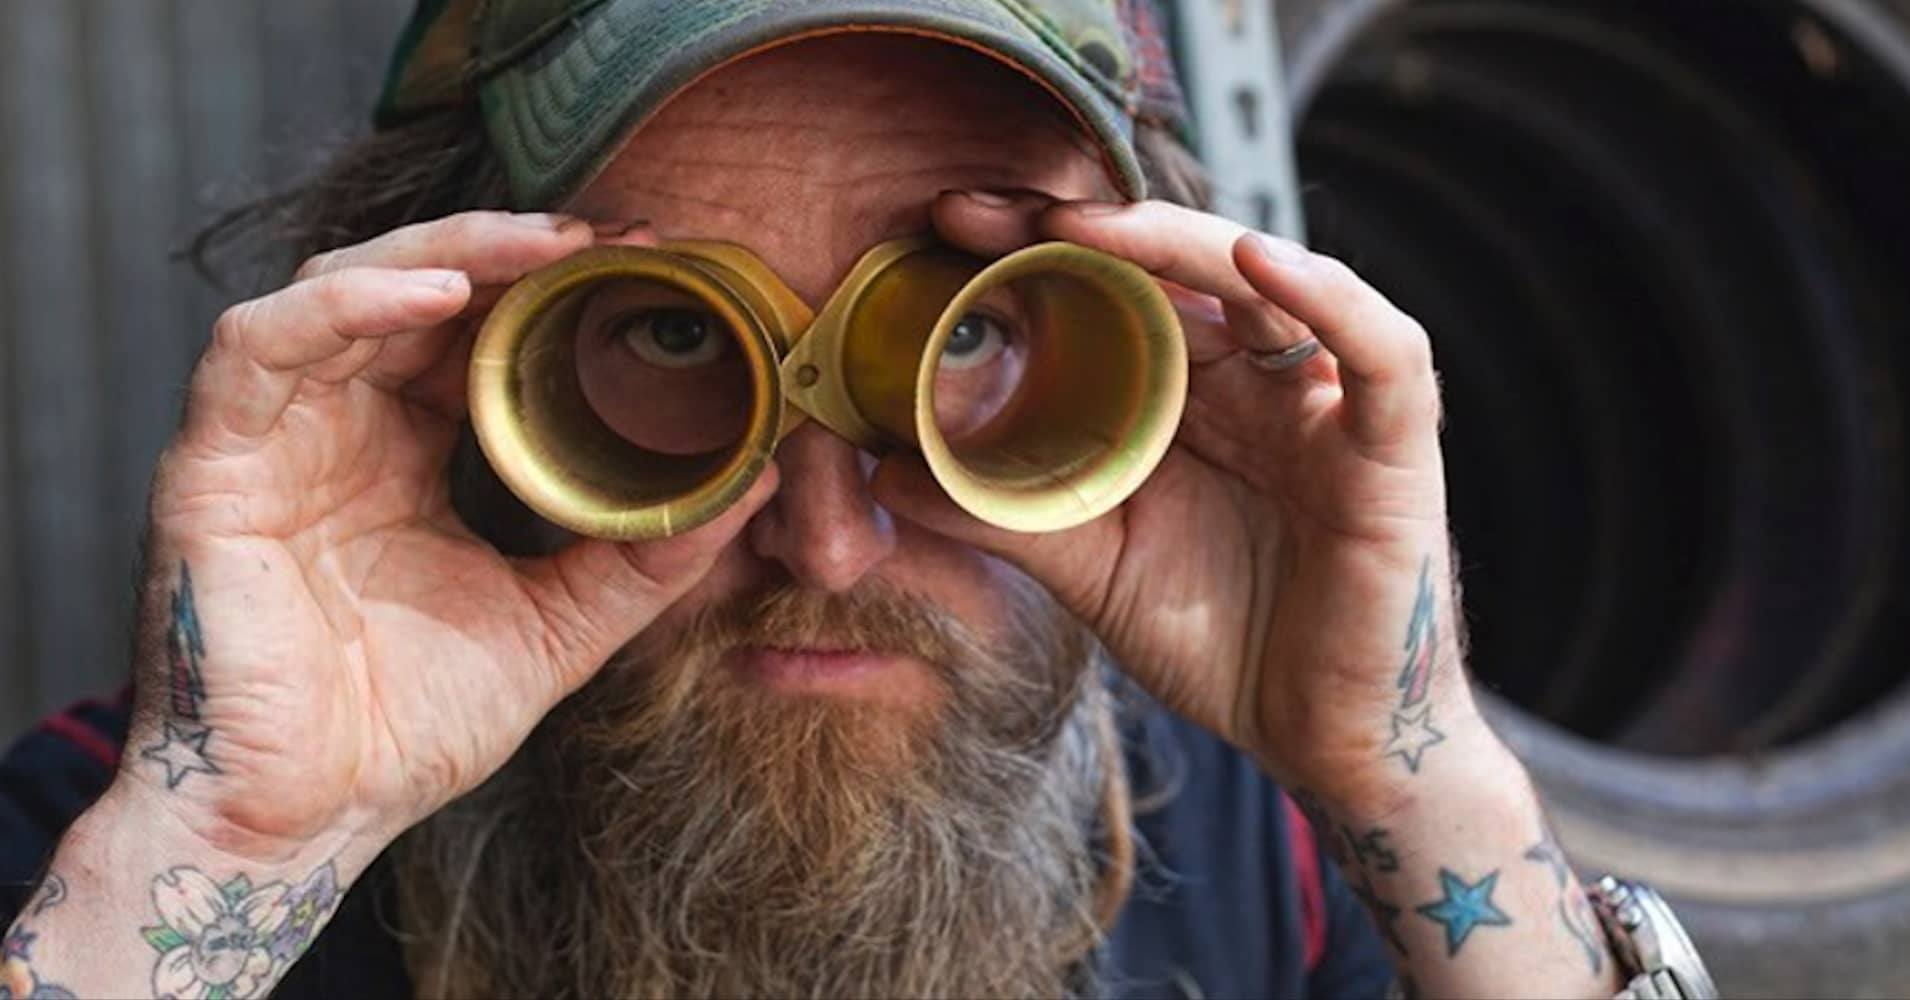 magnus walkers hobby is designing 300000 porsches that arent for sell - Designer Mobel Kollektion La Chance